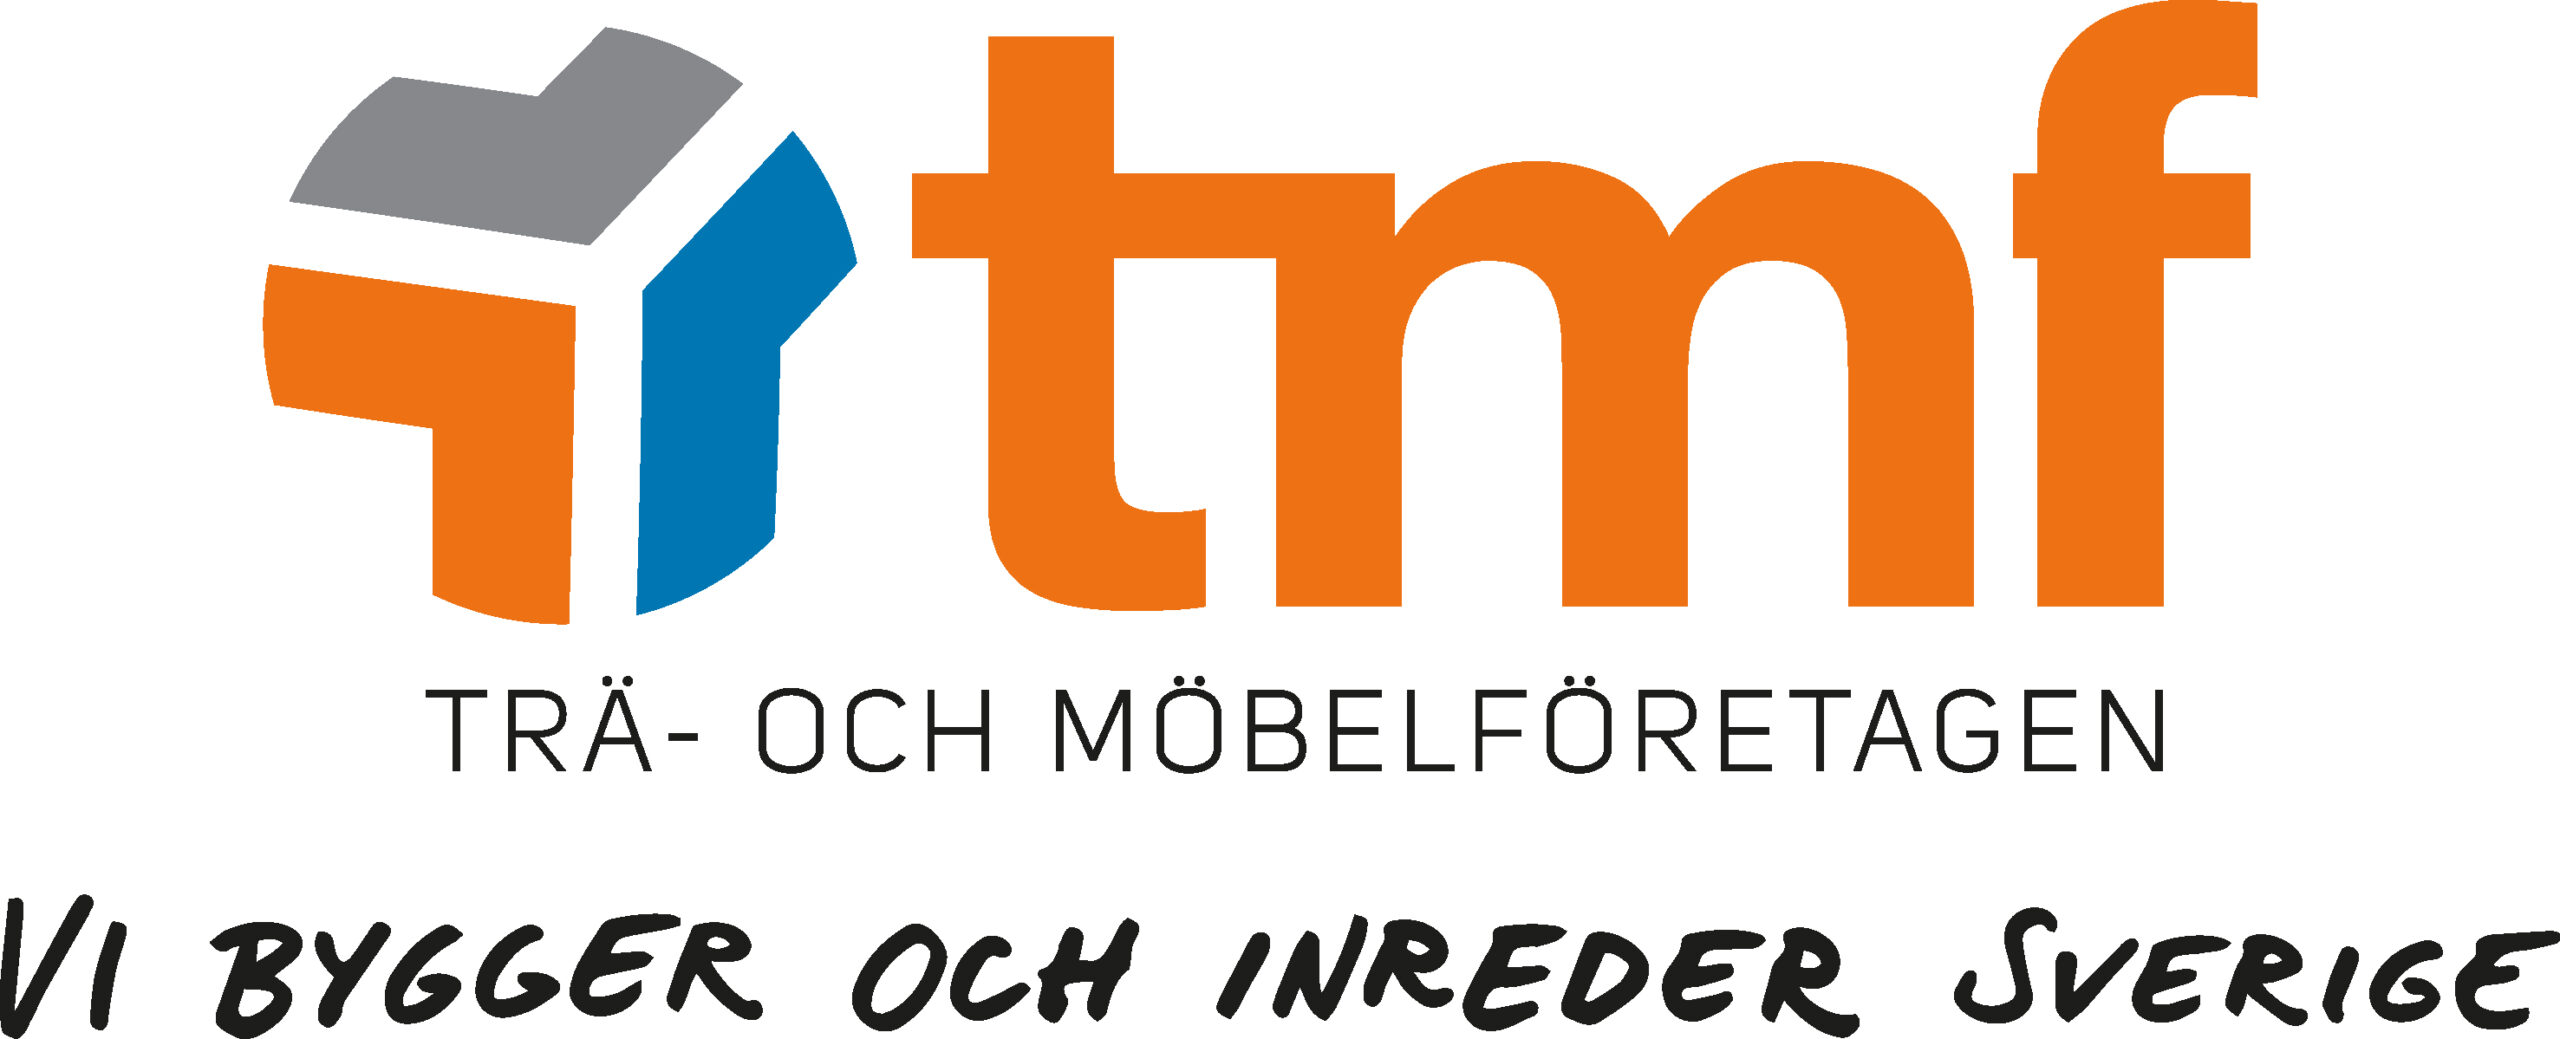 Gropens Snickeri medlem i TMF